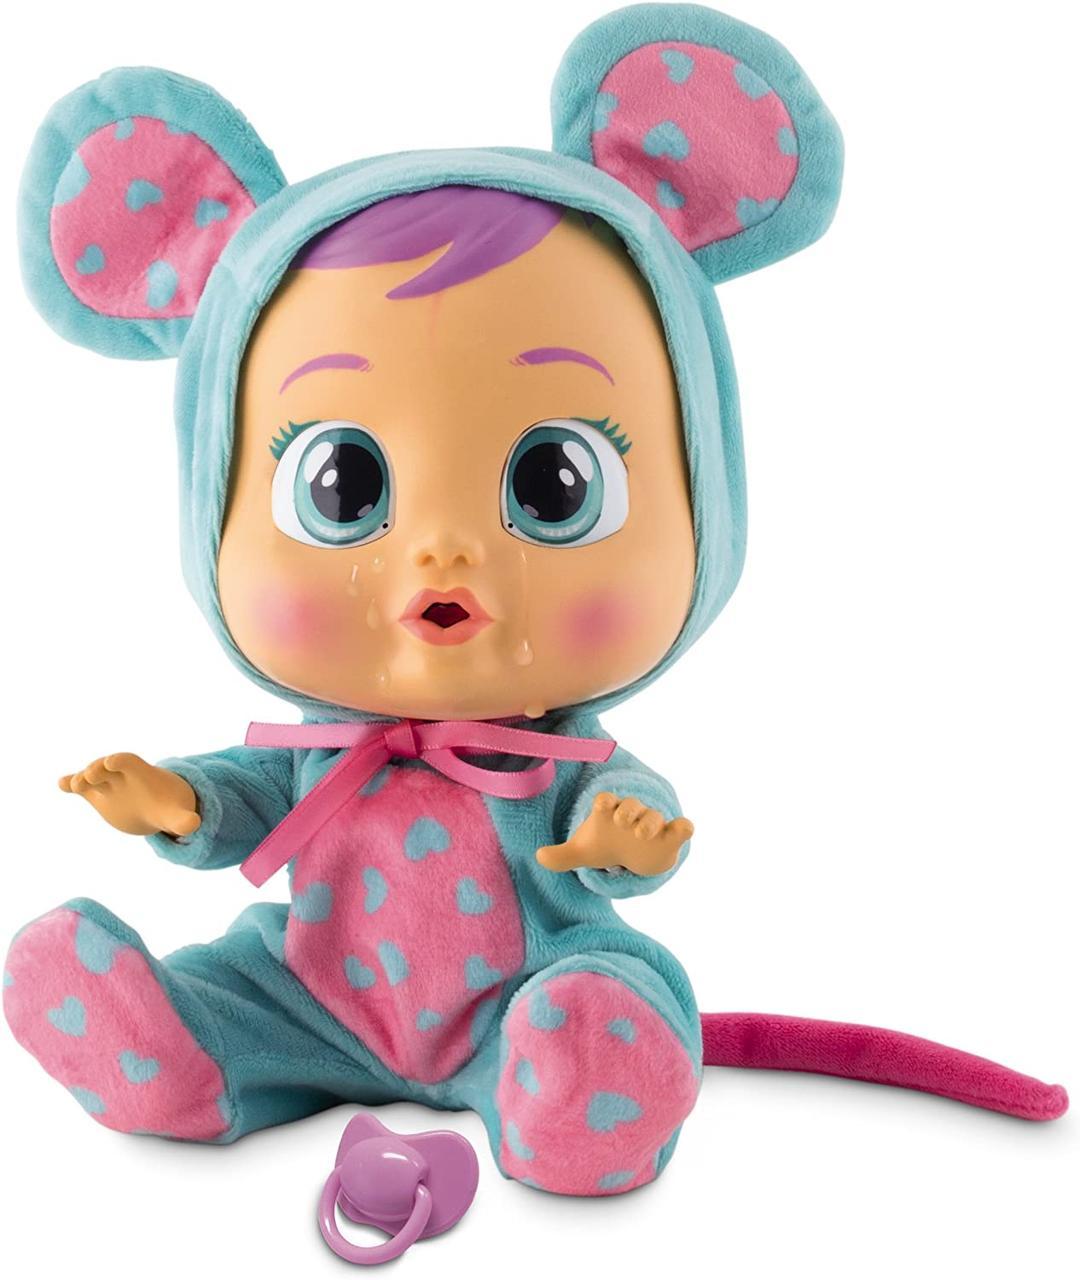 Cry Babies Интерактивная кукла пупс Плачущий младенец Лала мышка  Lala doll